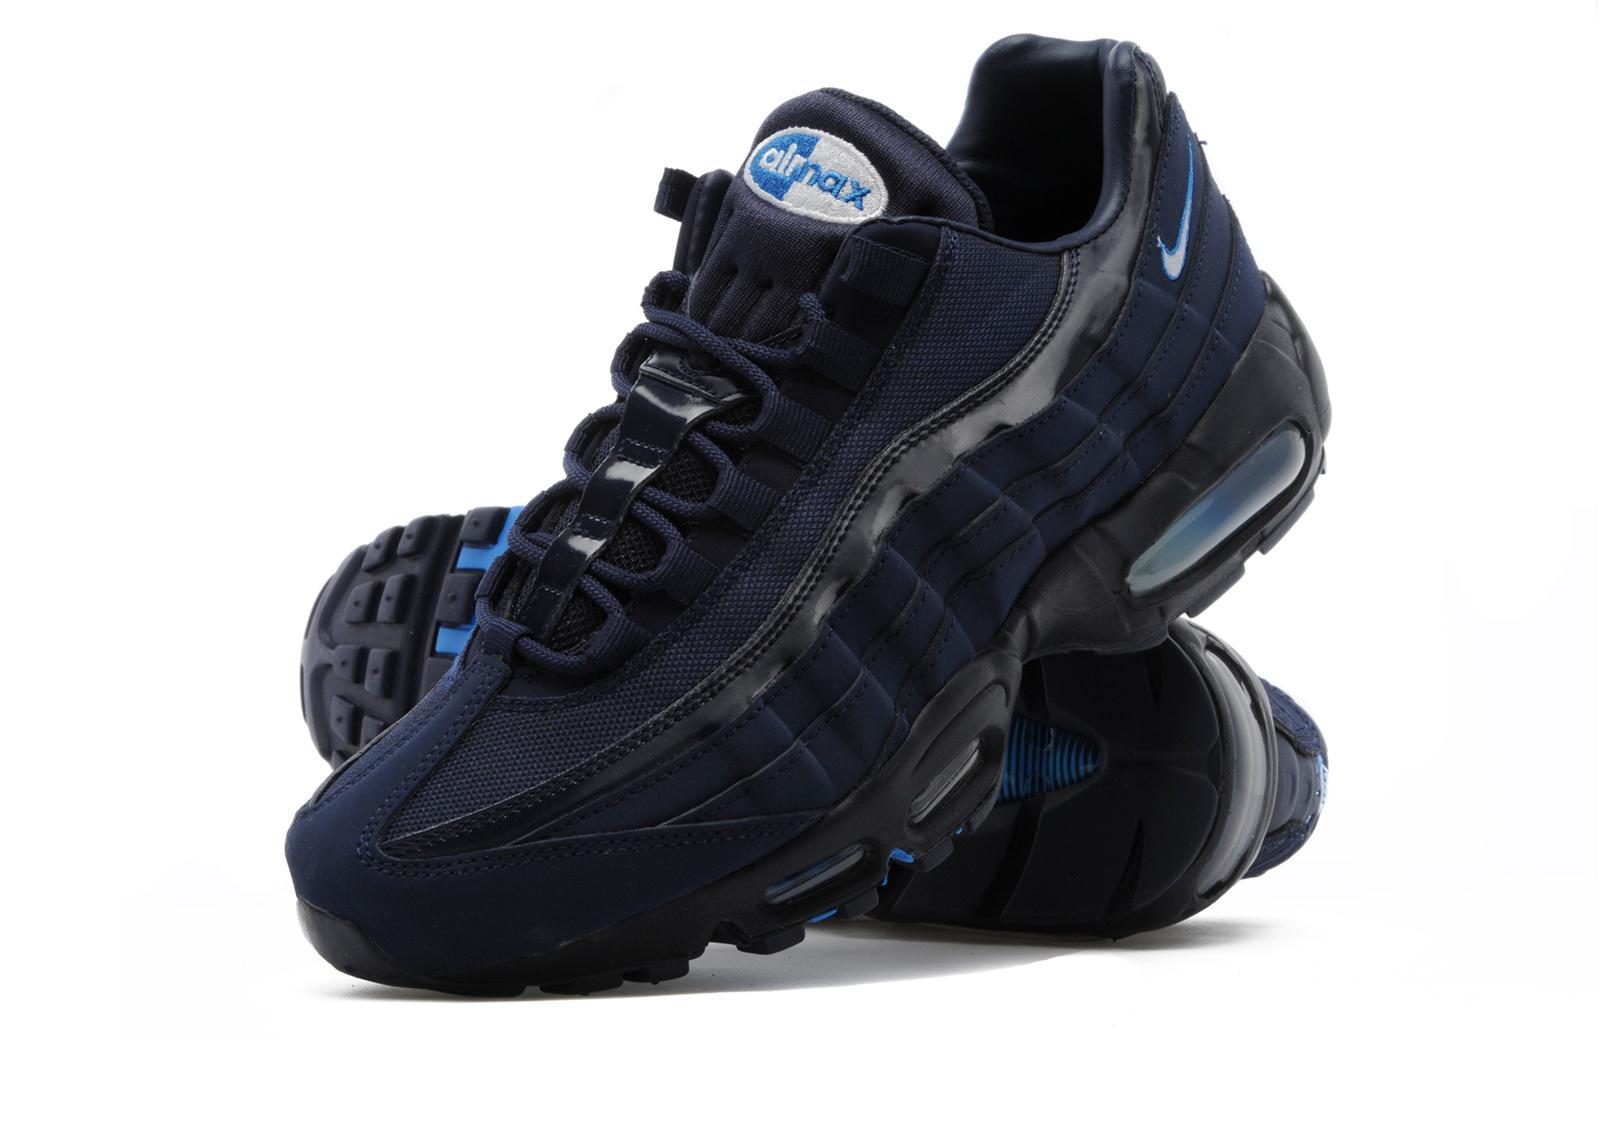 Nike Air Max 95 JD Sports Exclusive (Military Blue